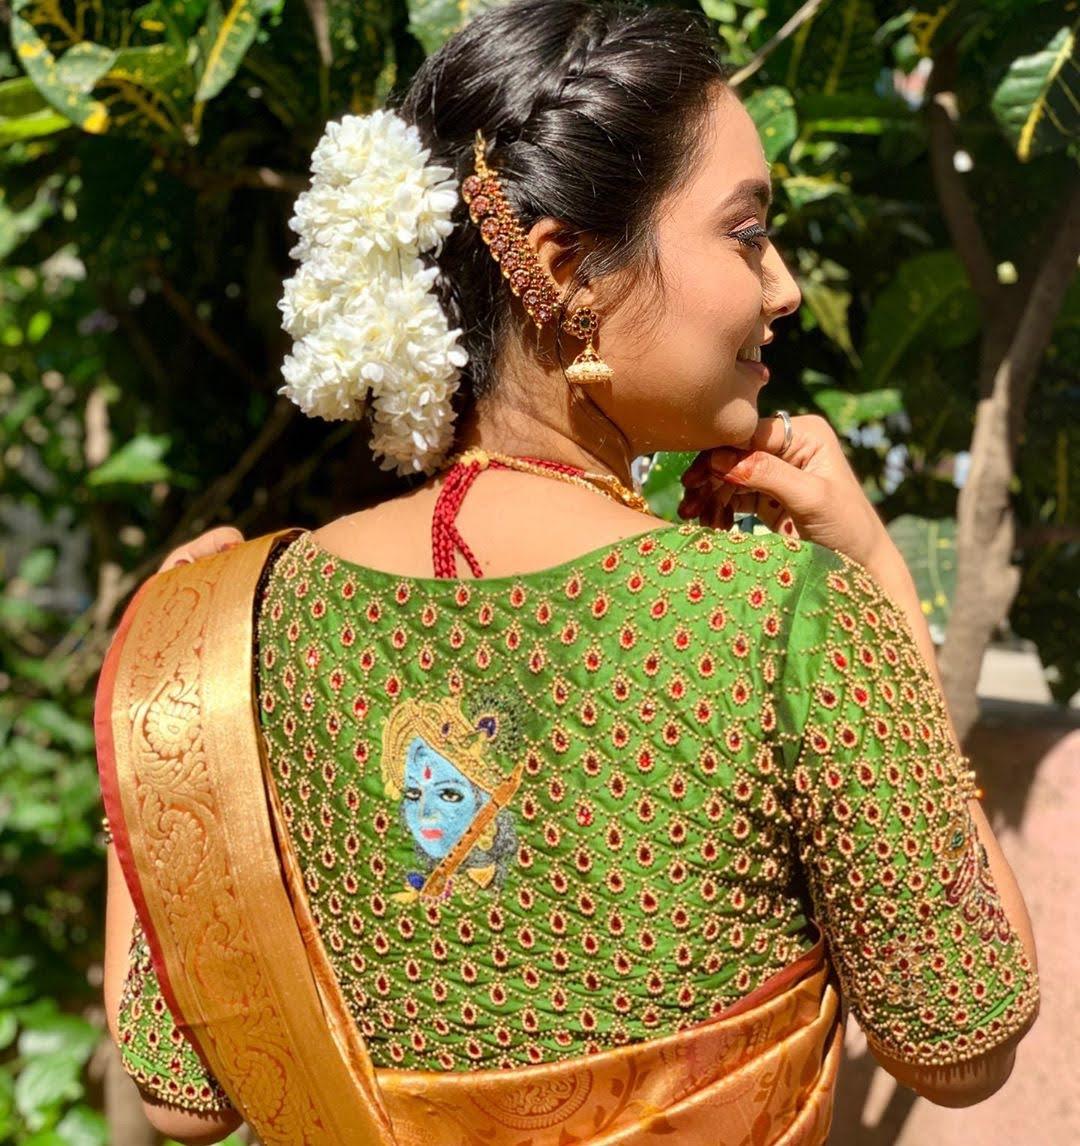 pavithra-janani-64744